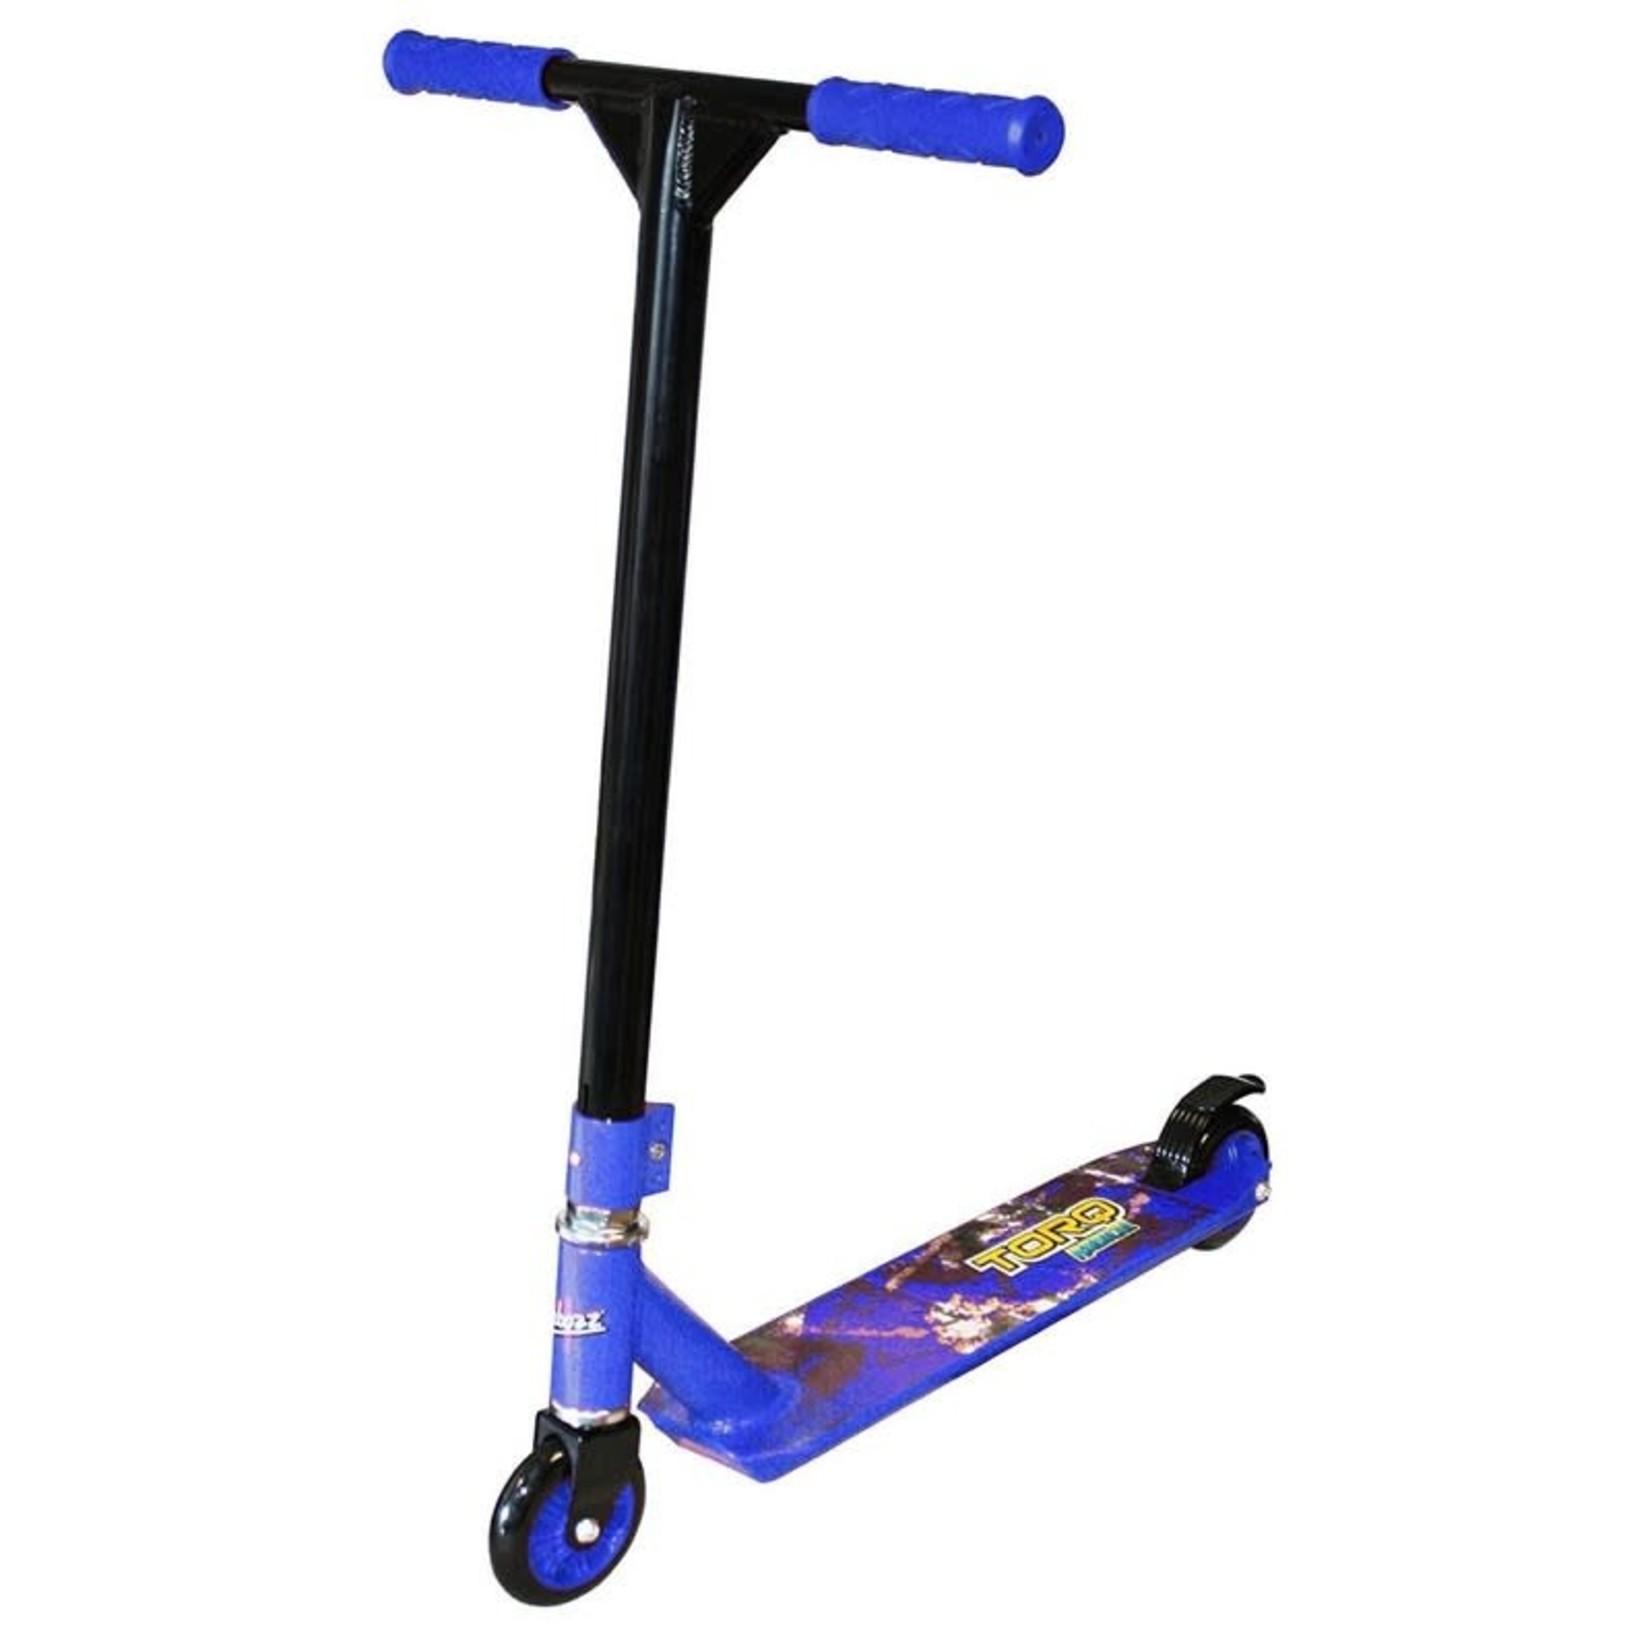 Ozbozz Torq Radical Aluminium Scooter - Black